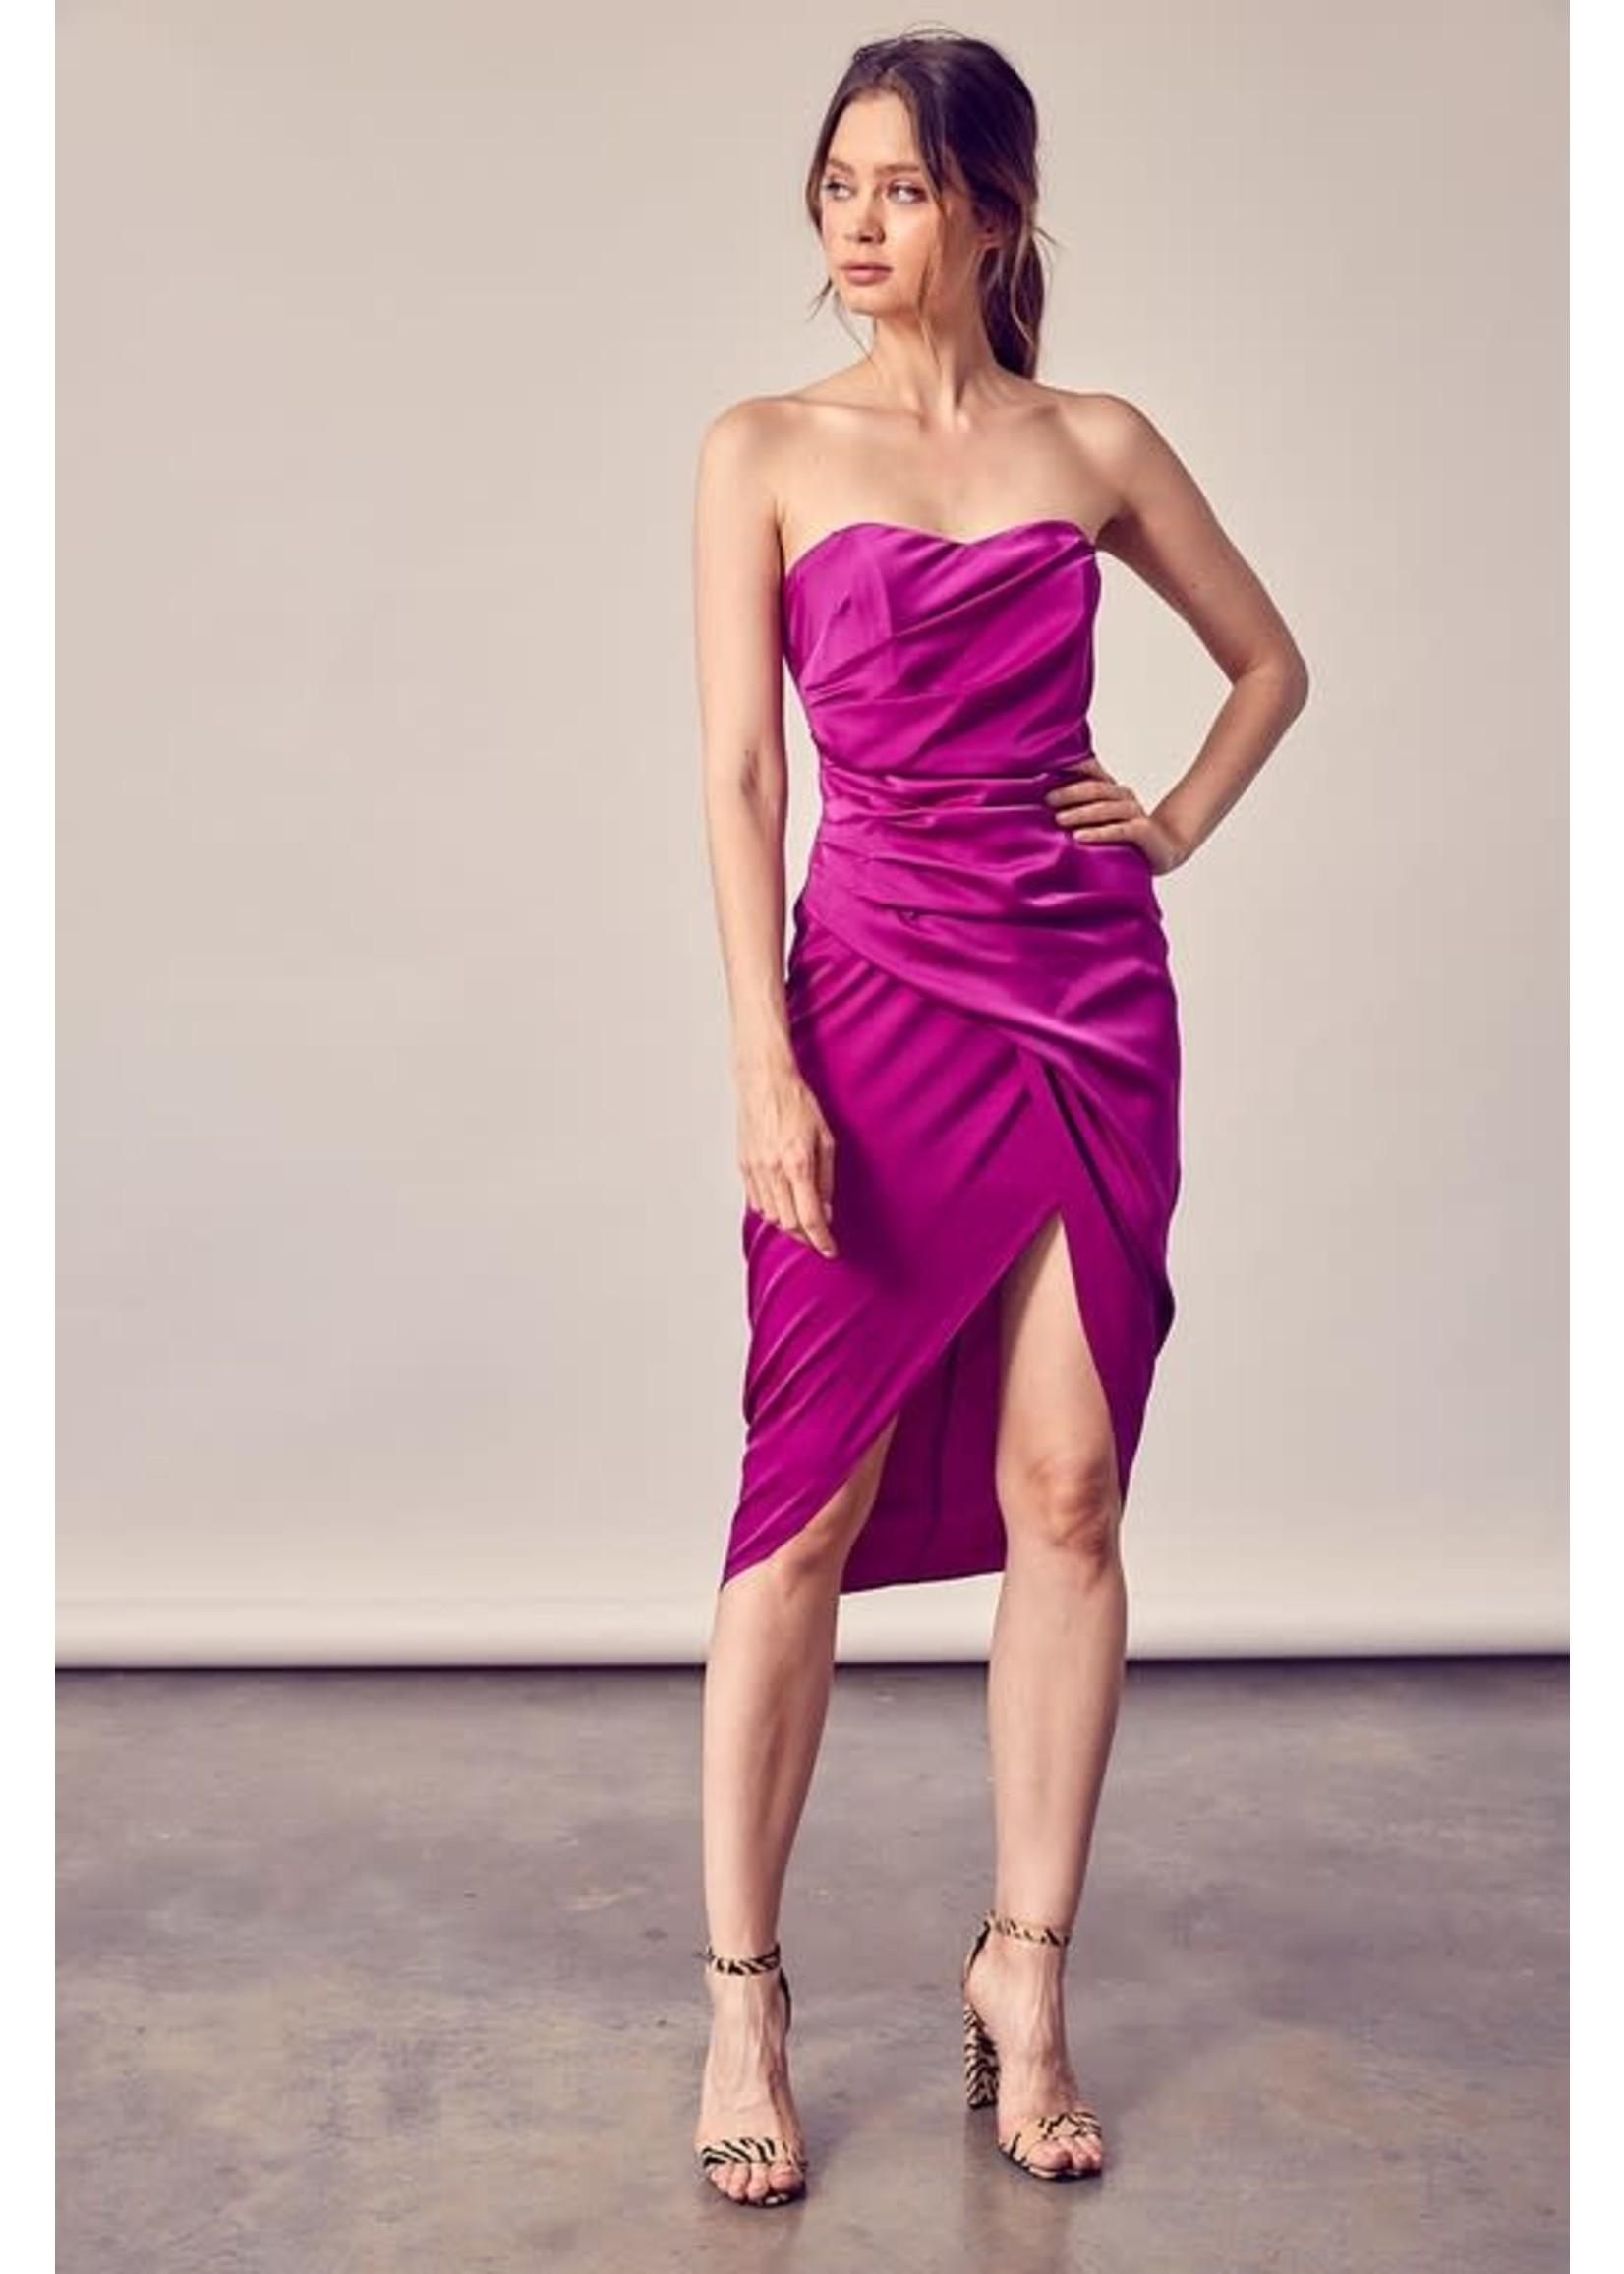 DO + BE Tulip Skirt Strapless Wrap Midi Dress - GY1158